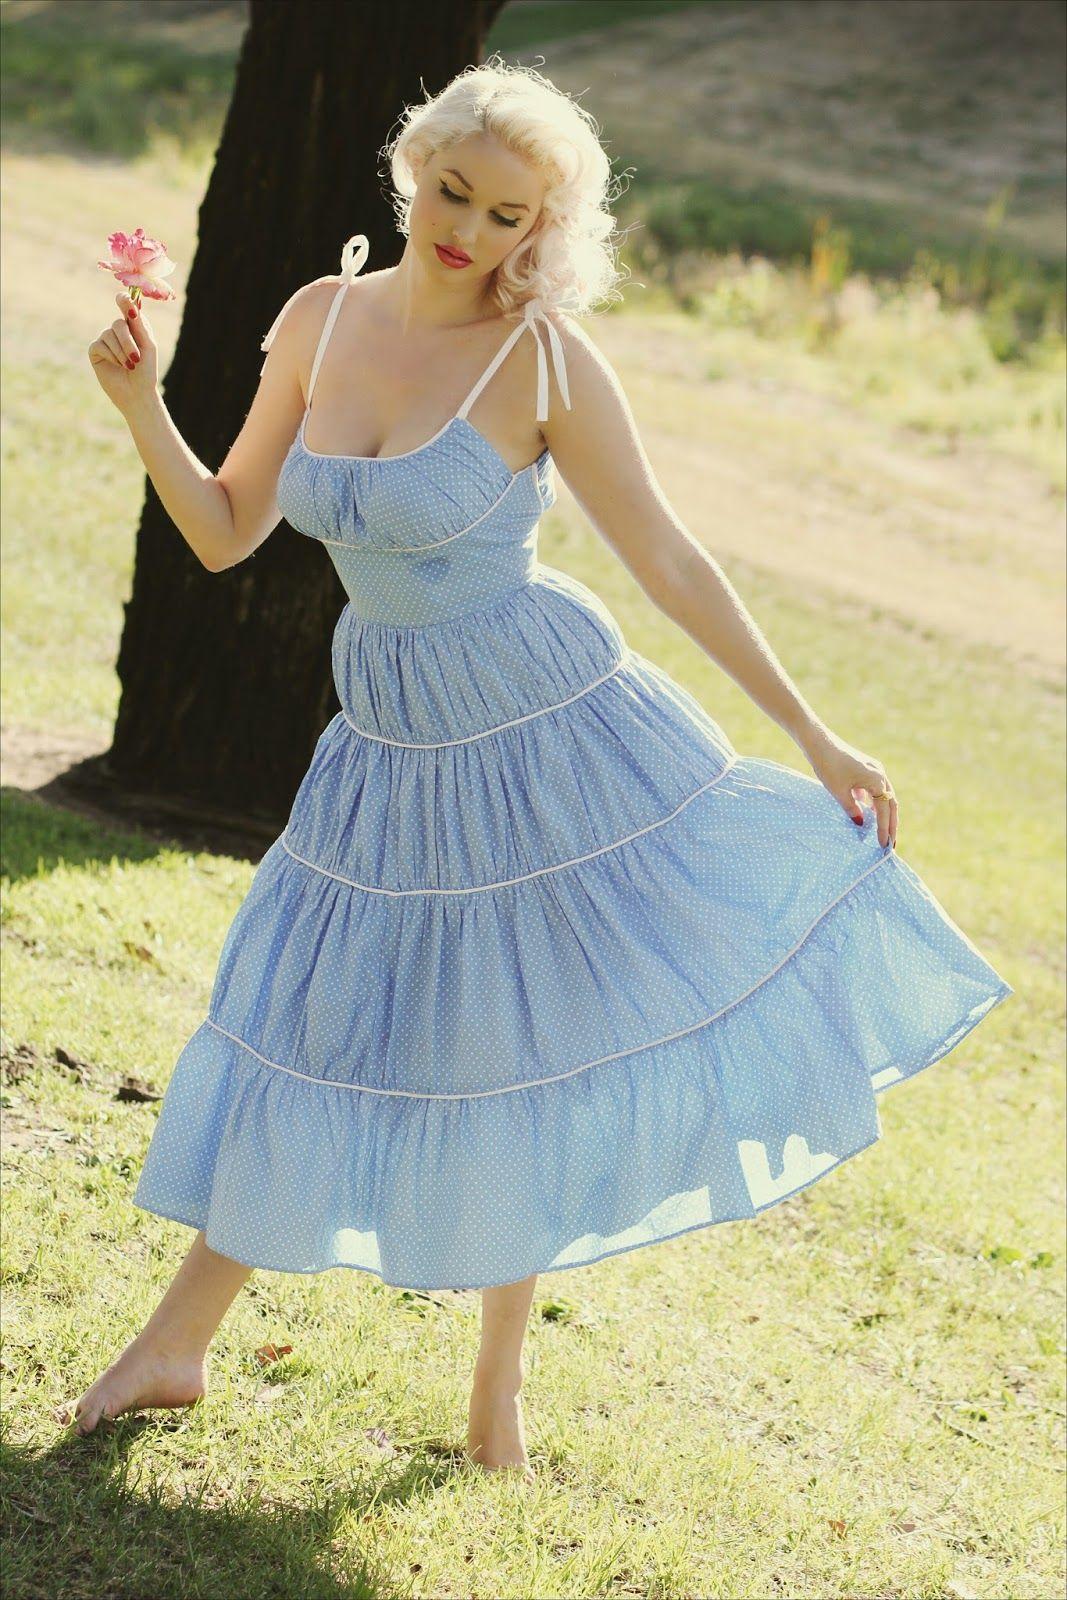 Vintage Blog The Pink Collar Life Marilyn S Blue Dress Summer Dresses Leotard Fashion Petticoat Dress [ 1600 x 1067 Pixel ]